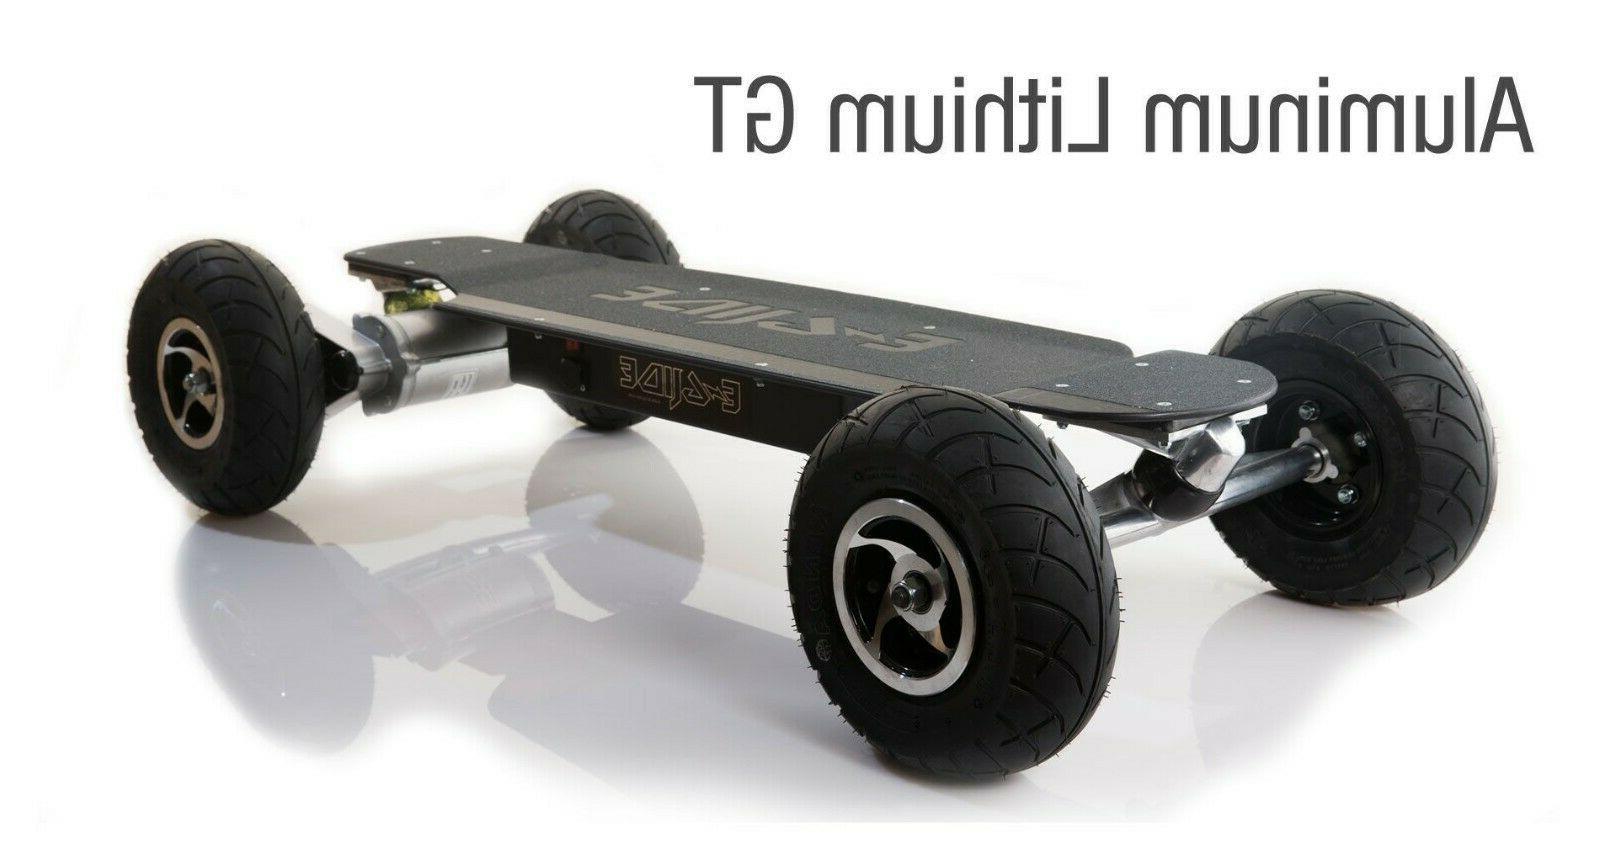 All Offroad Skateboard Front Truck Axle